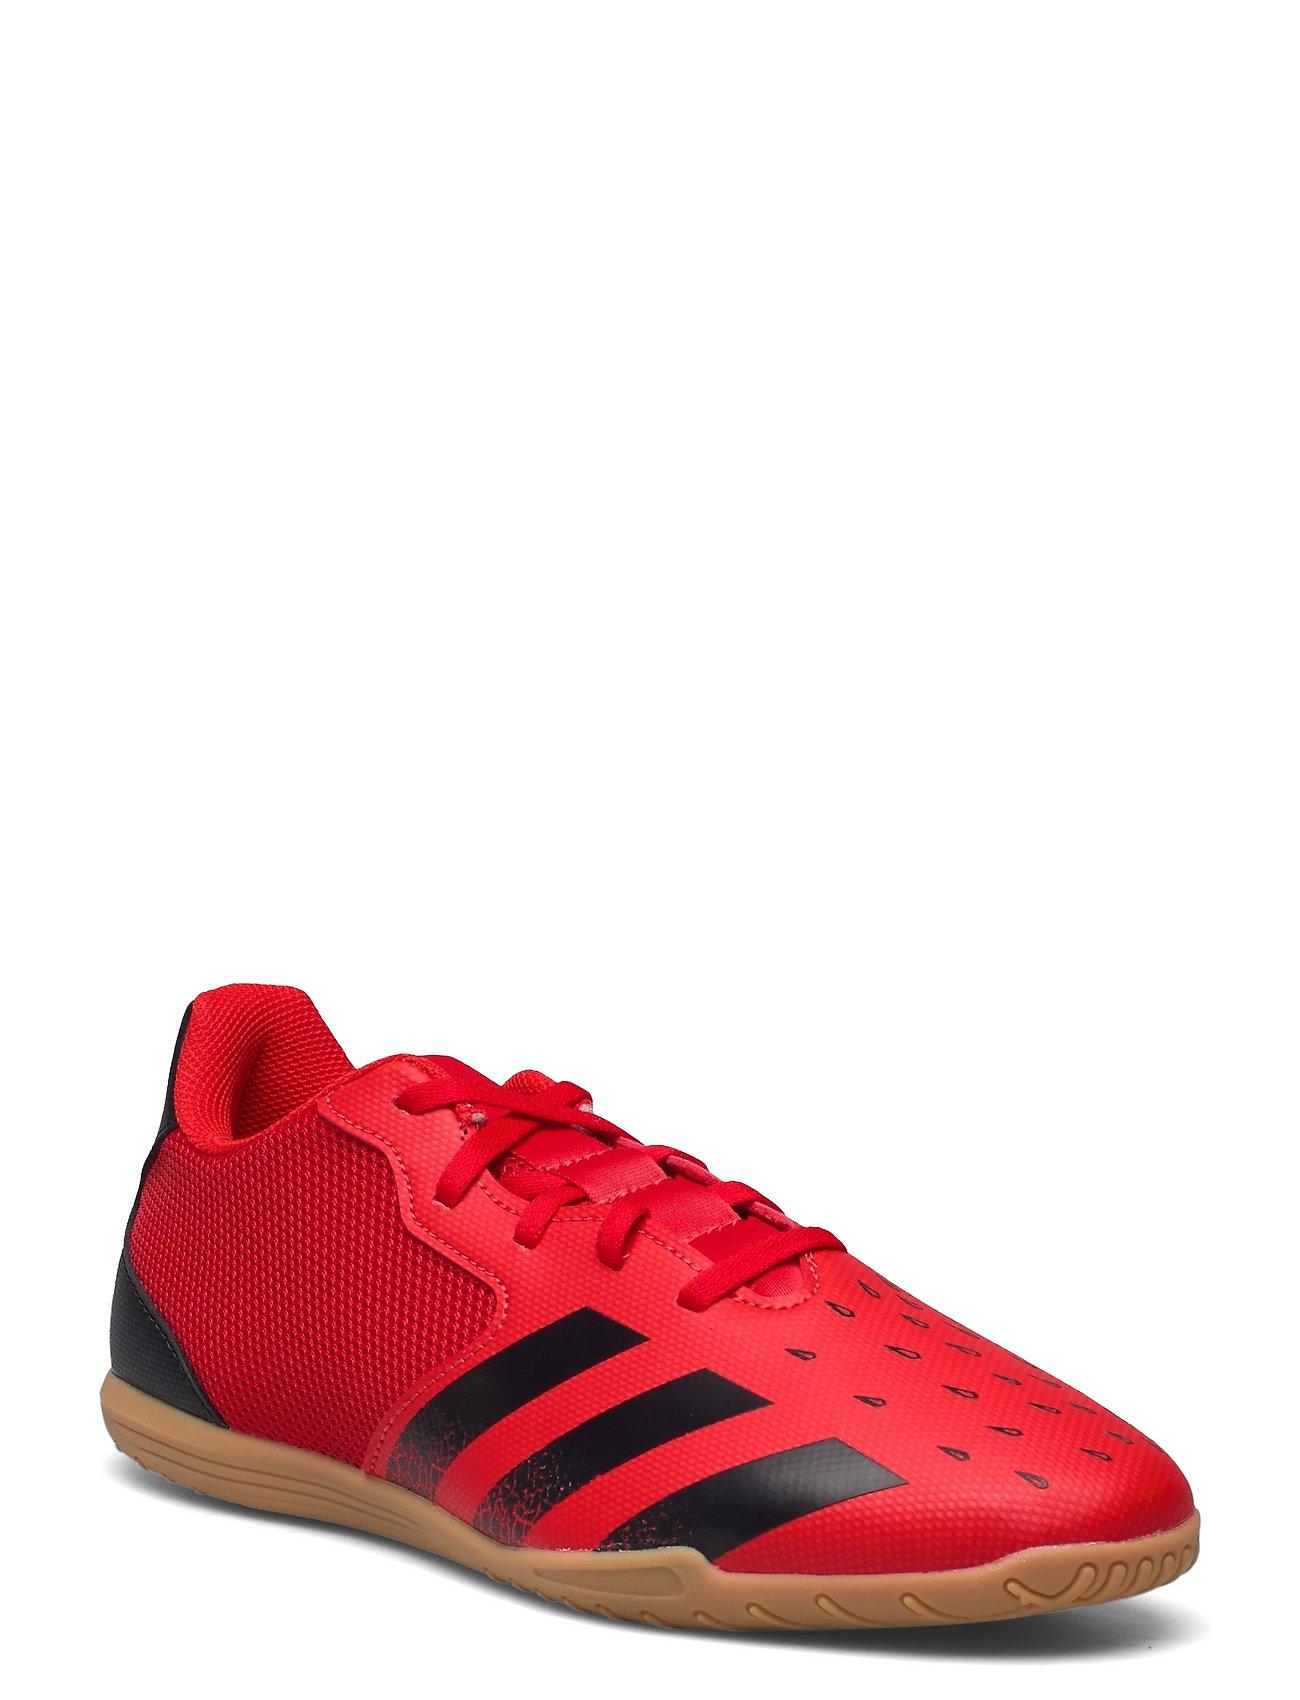 Predator Freak.4 Sala Indoor Boots Q3q4 21 Shoes Sport Shoes Football Boots Rød Adidas Performance